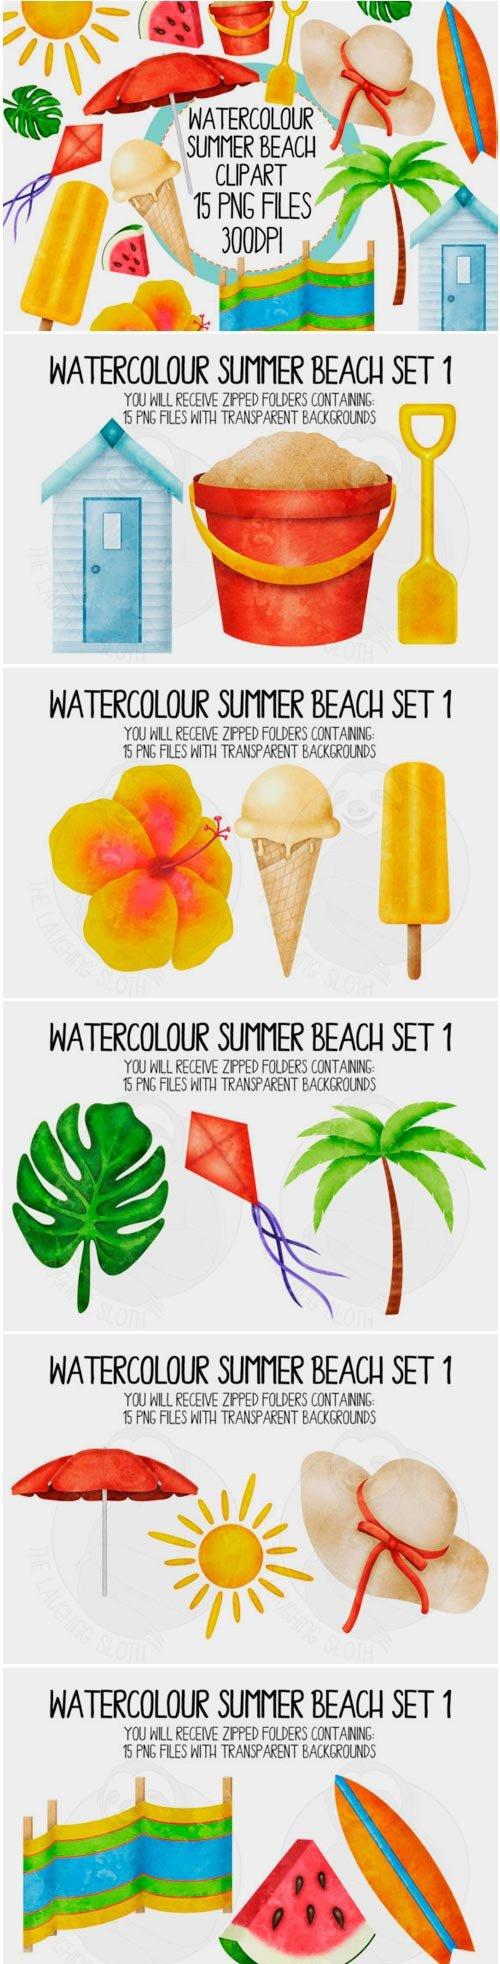 Watercolour Summer Beach Set 1 1575825